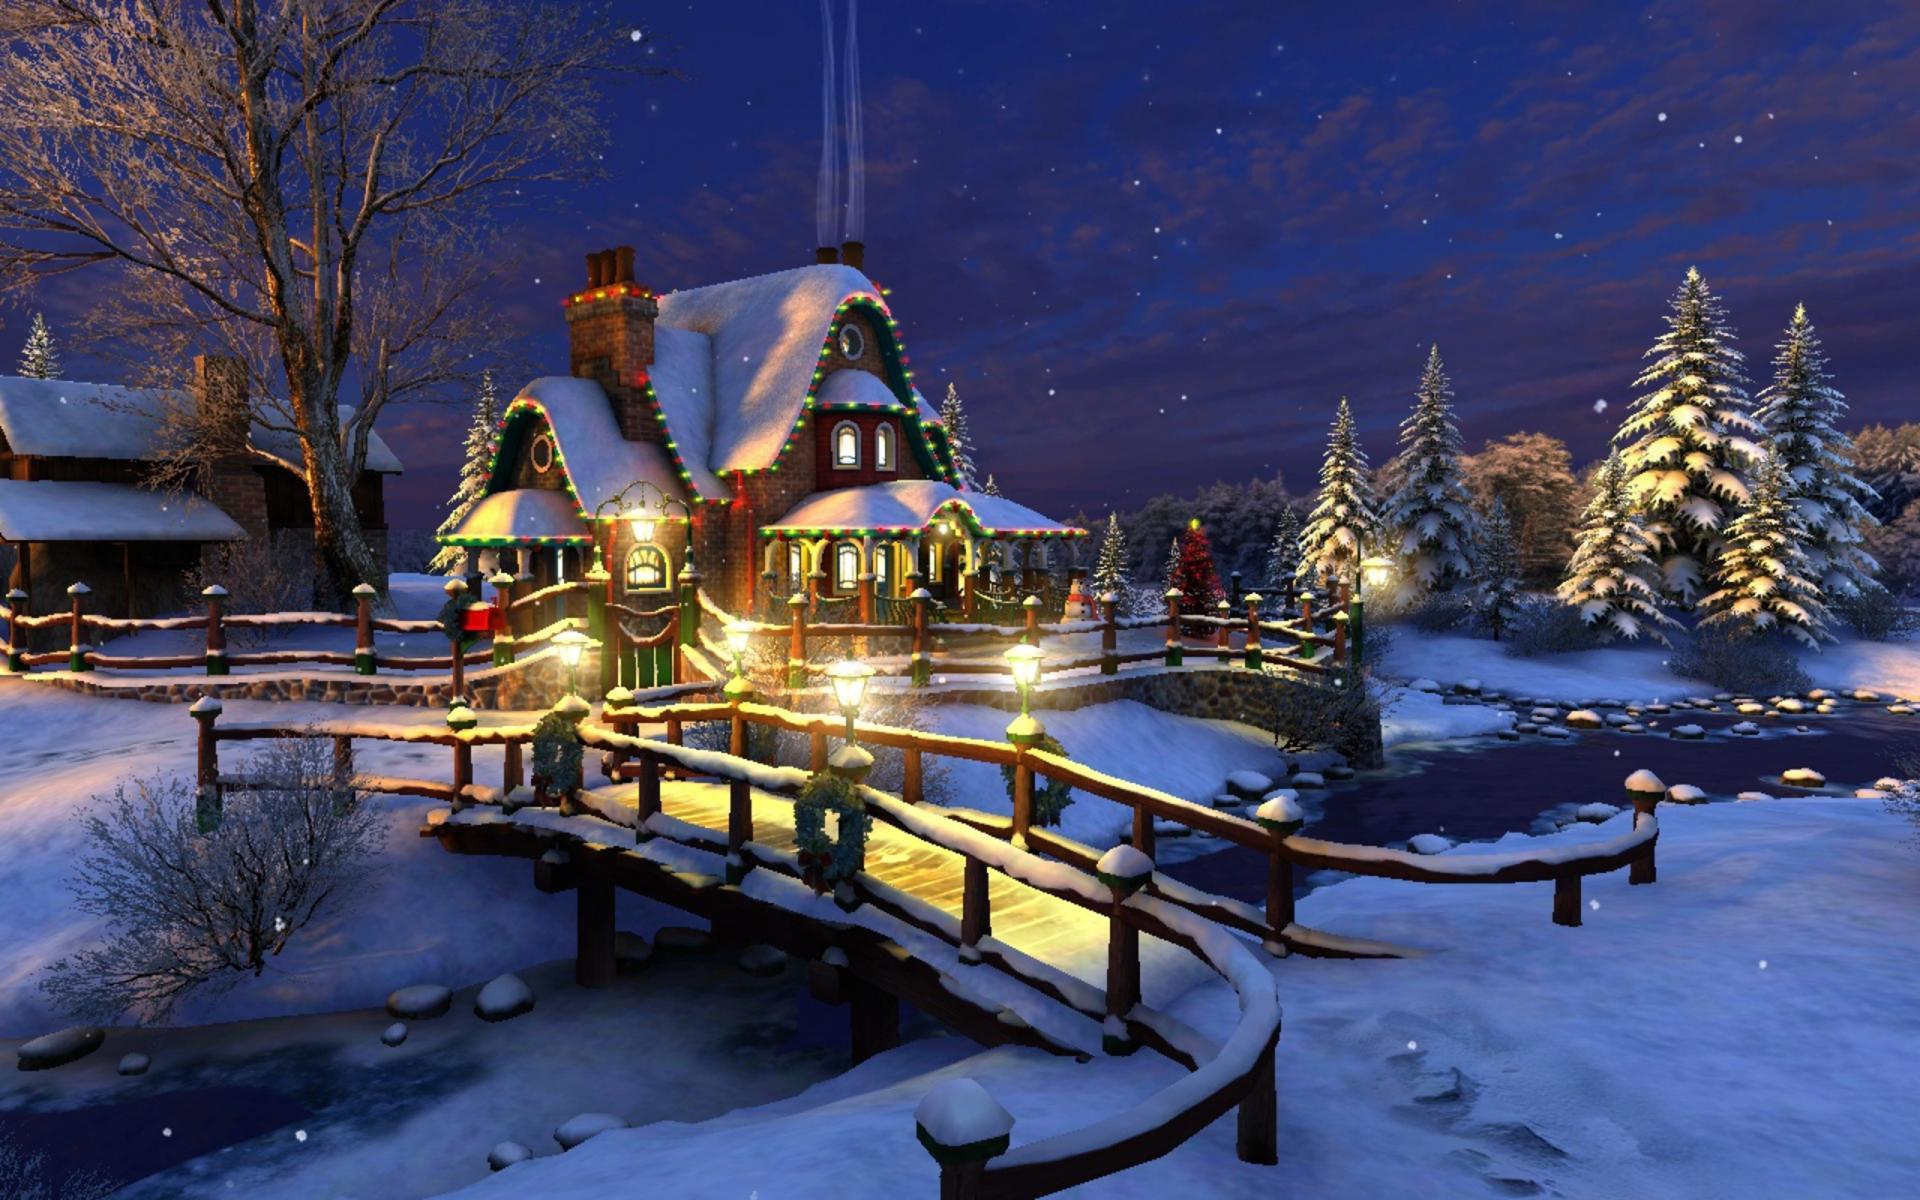 1920x1200-px-Christmas-holidays-seasonal-1317229.jpg